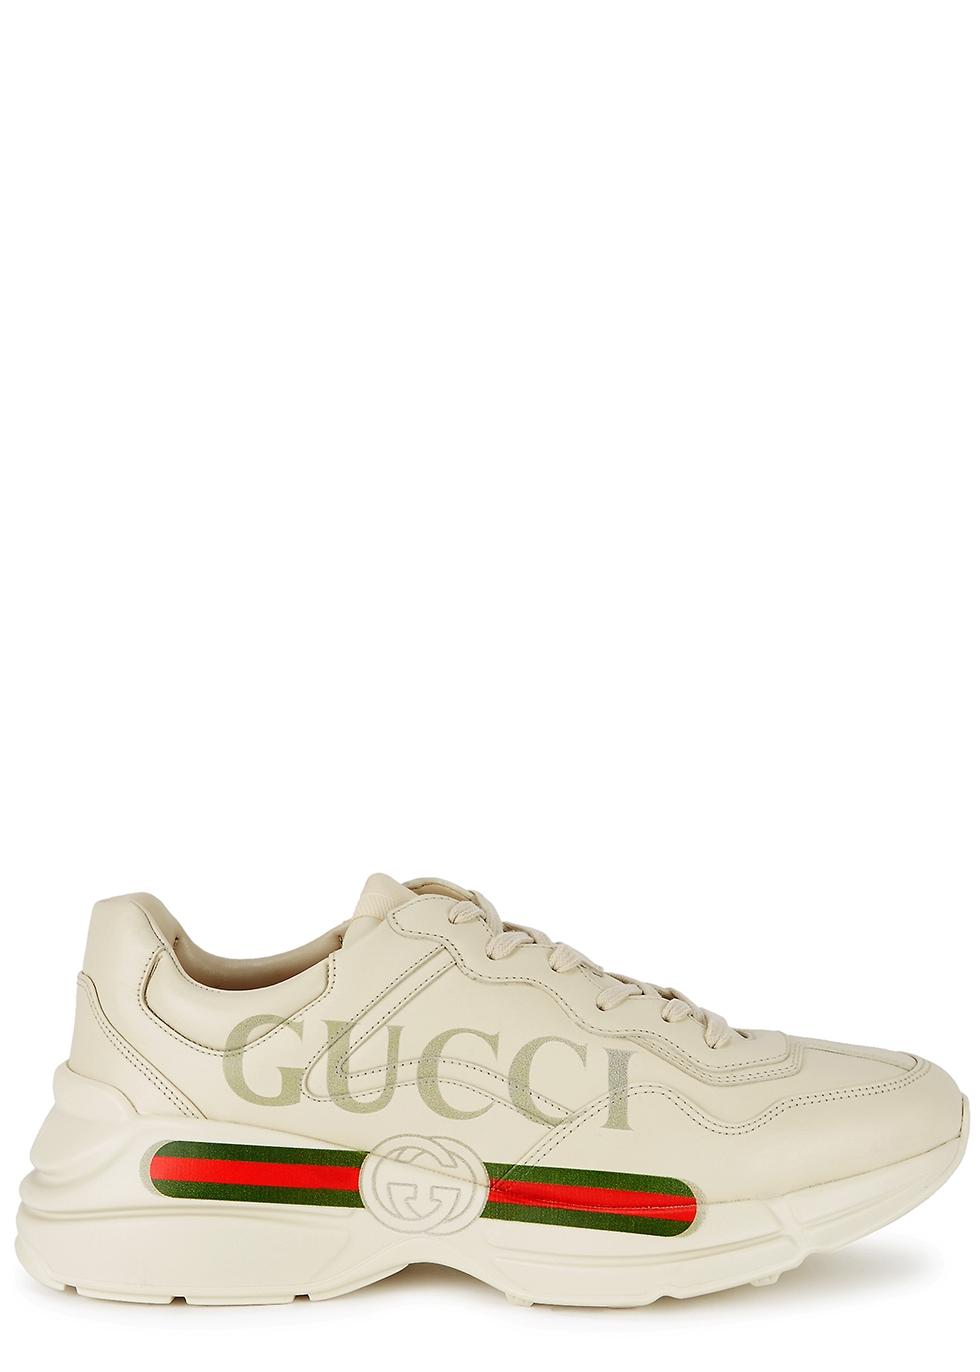 leather sneakers - Harvey Nichols